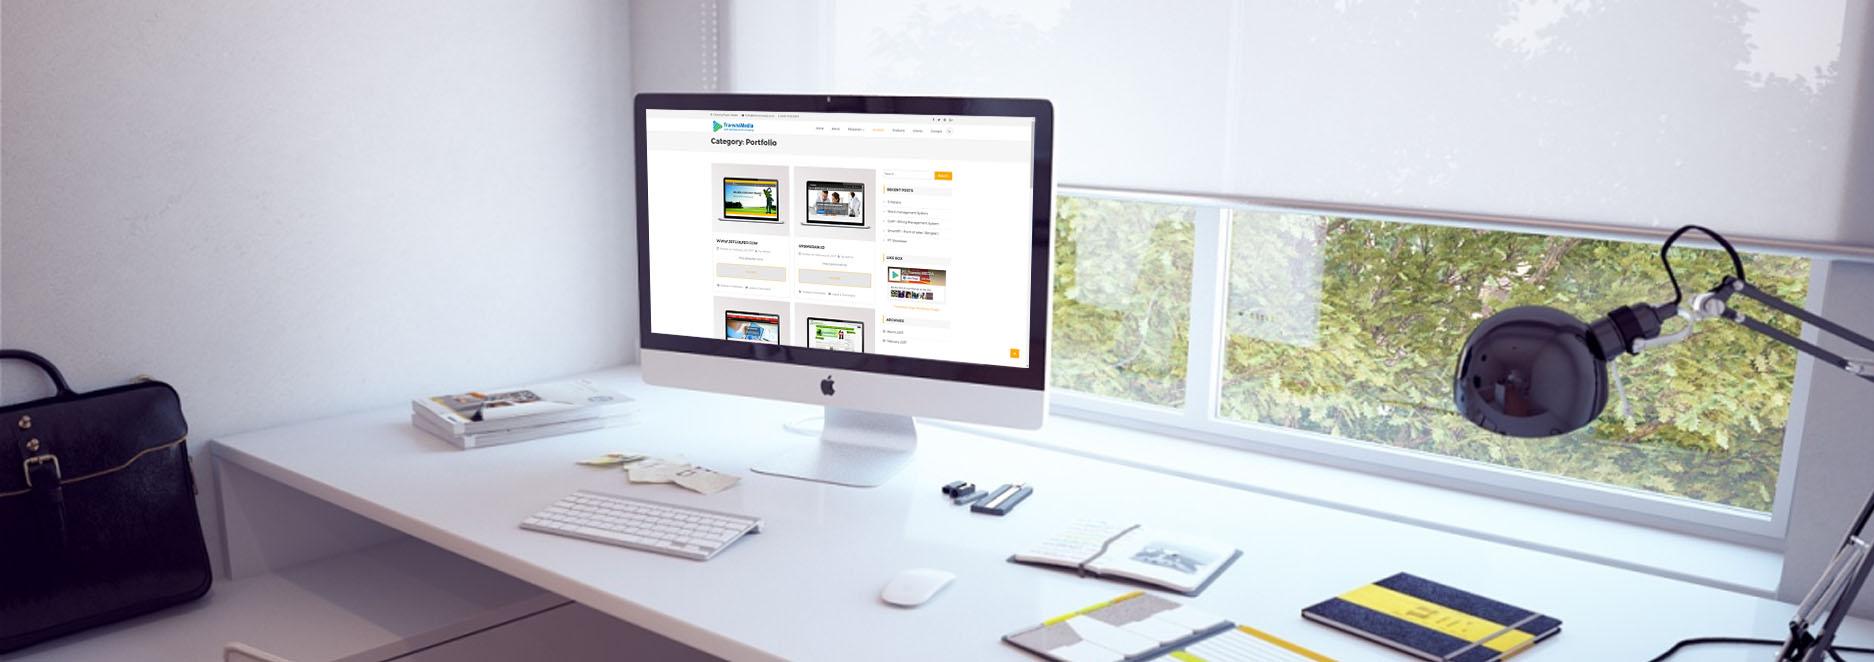 jasa pembuatan website di cikarang bekasi dan sekitarnya